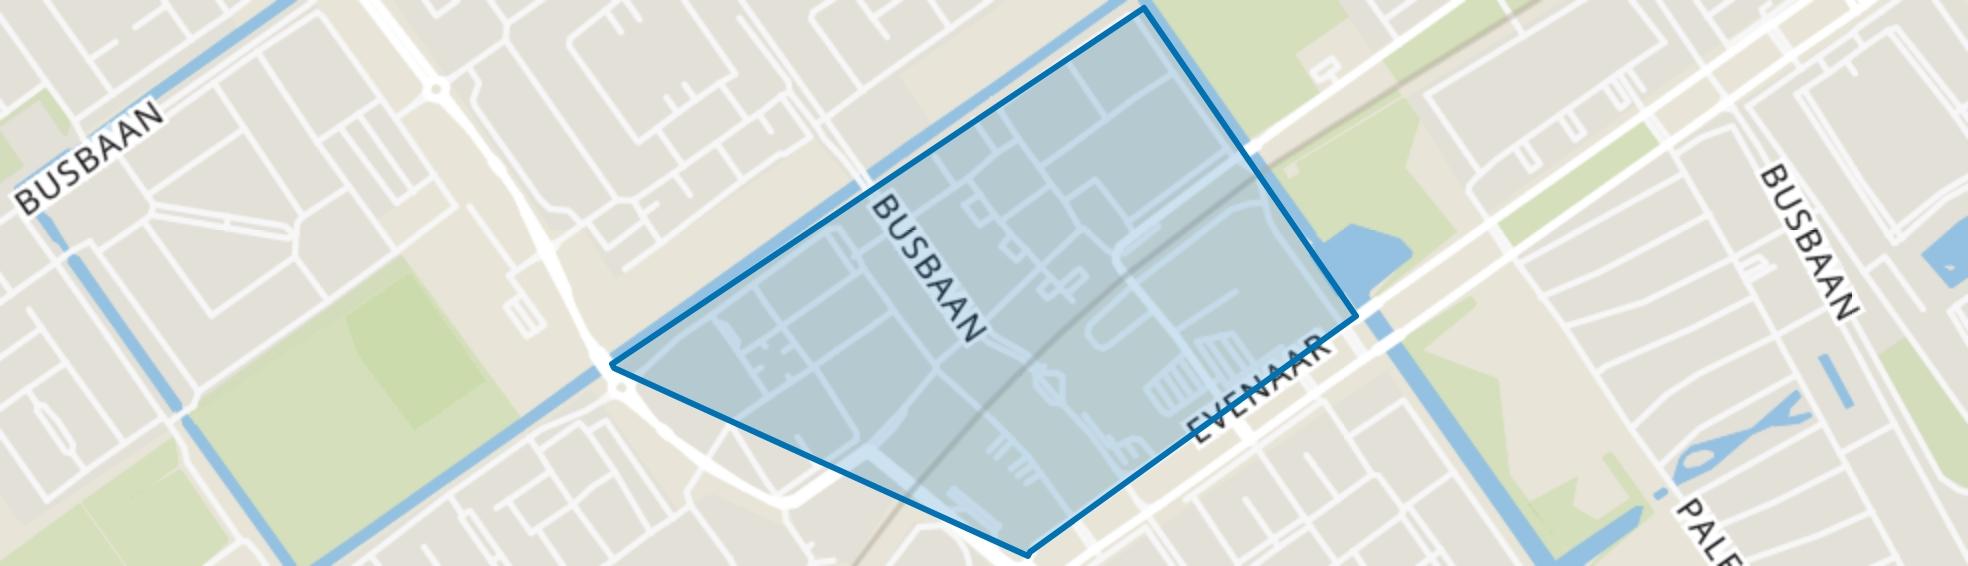 Centrum Almere Buiten, Almere map